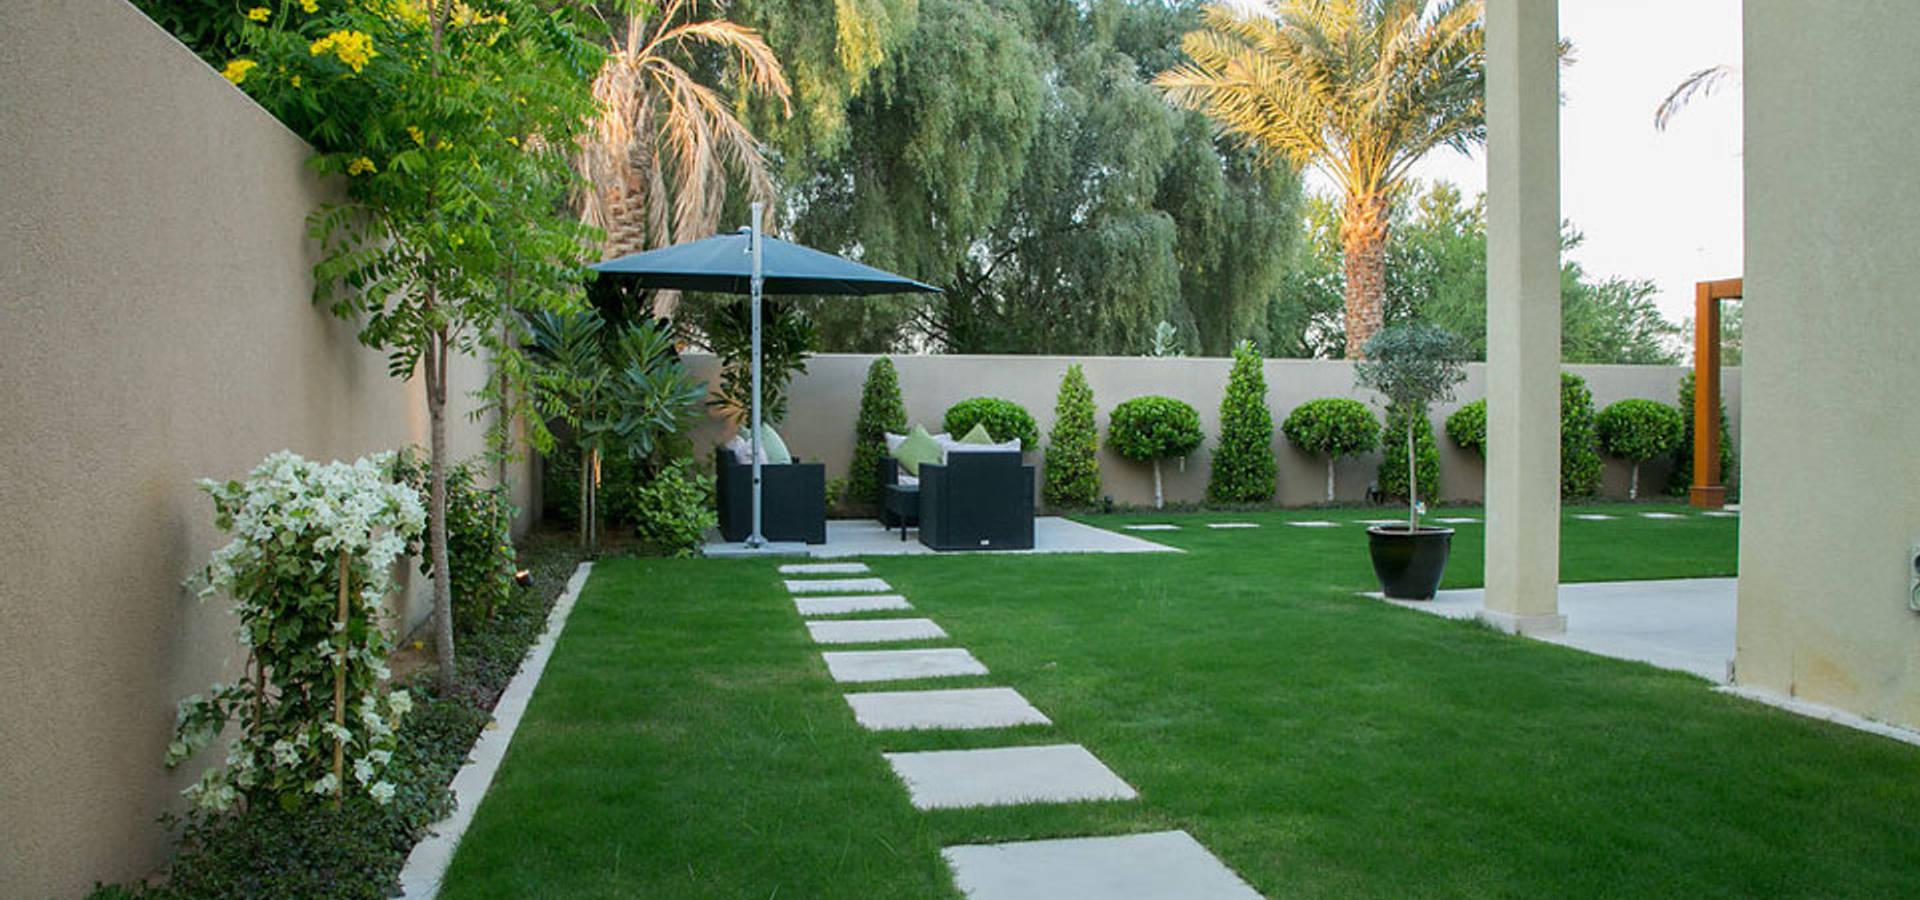 Hortus Landscaping Works LLC